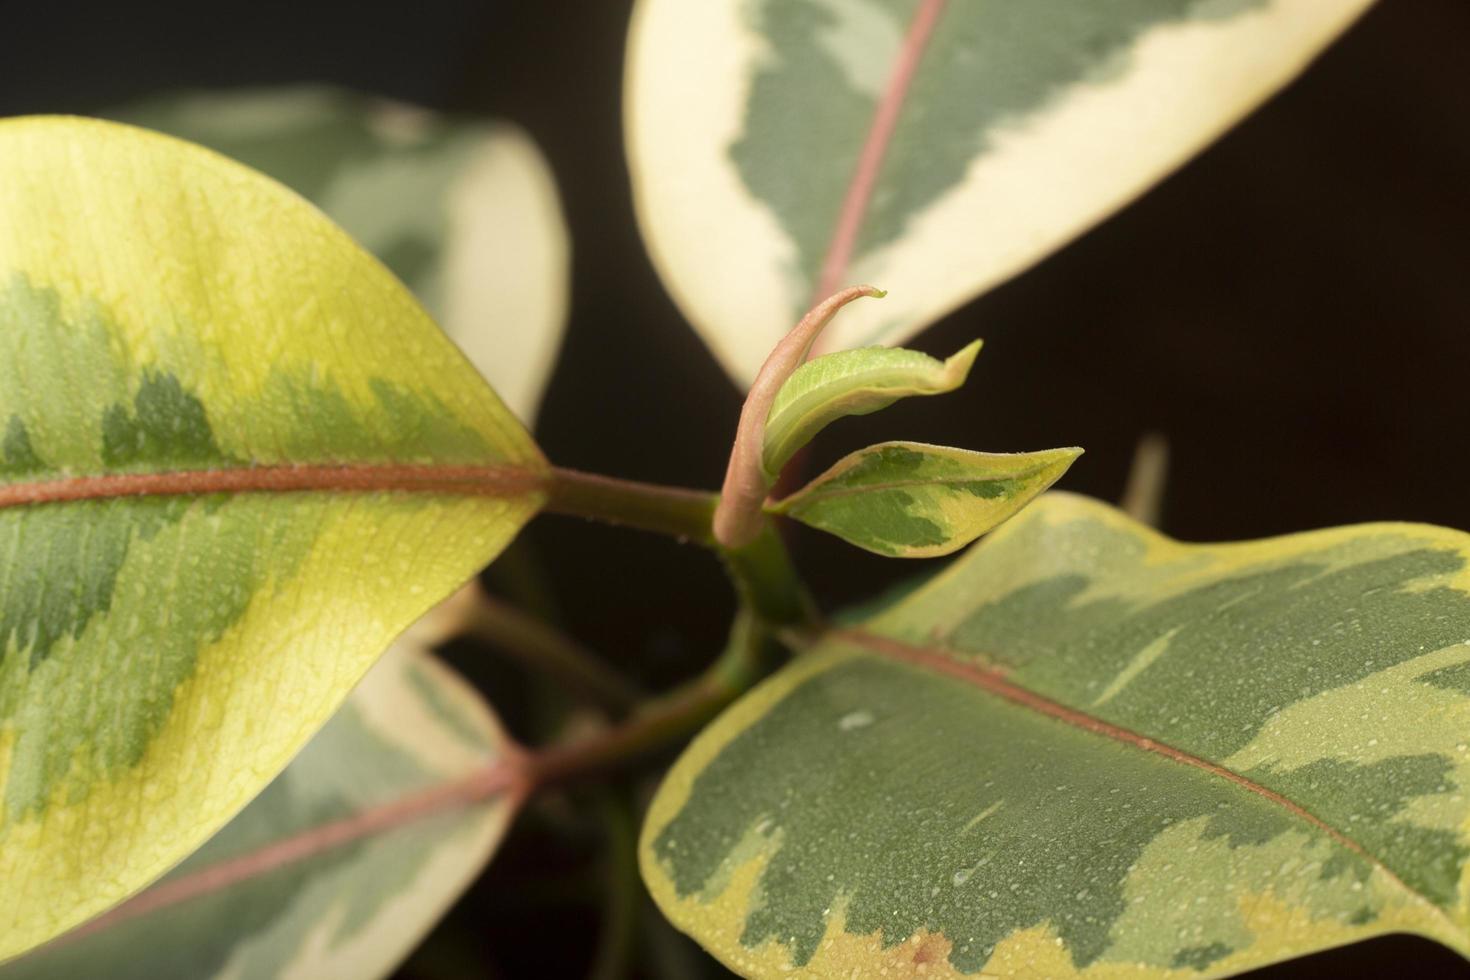 The indoor plant textures details photo